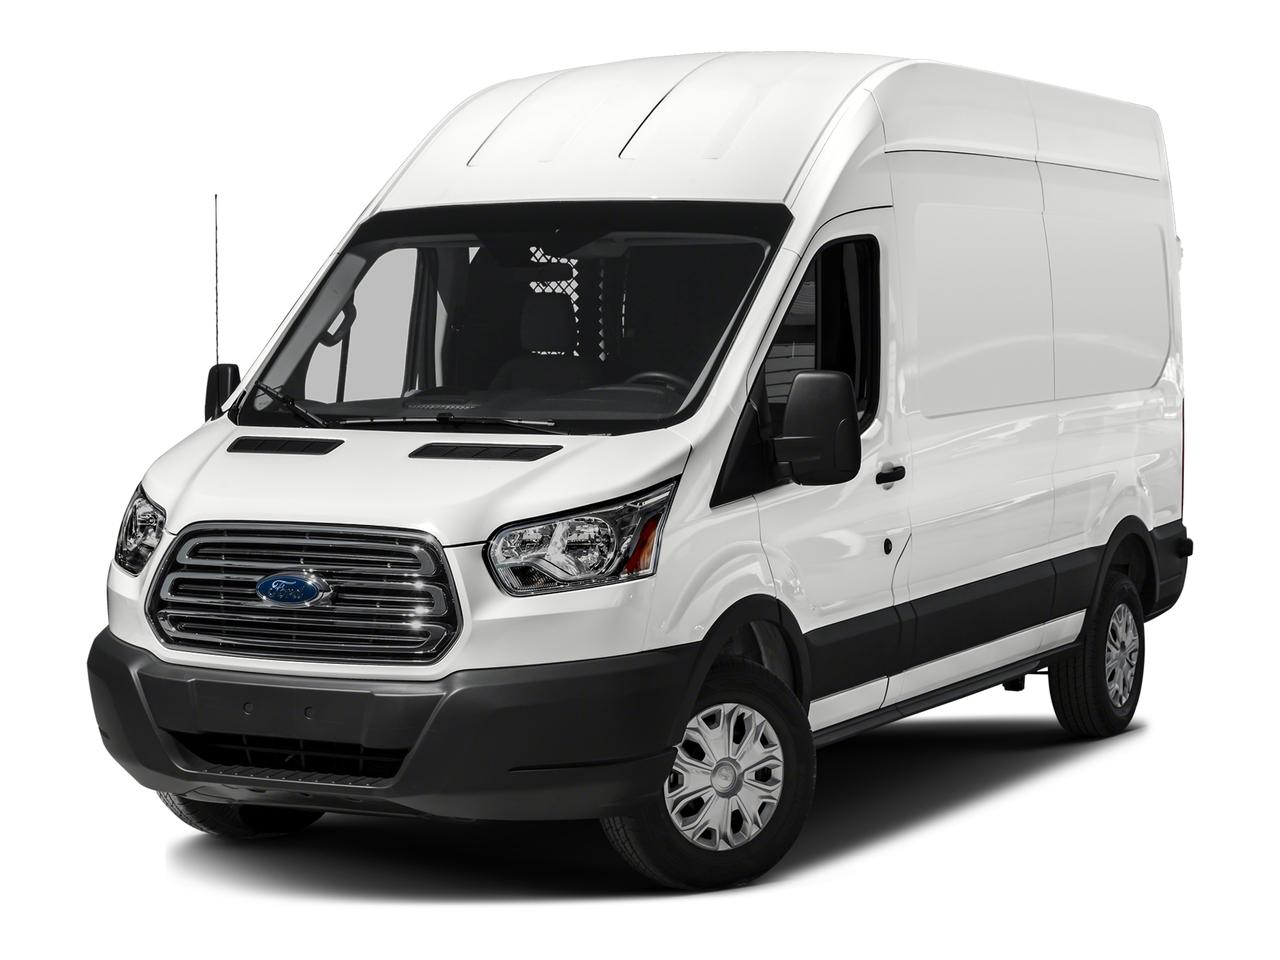 2016 Ford Transit Cargo Van Vehicle Photo in Joliet, IL 60586